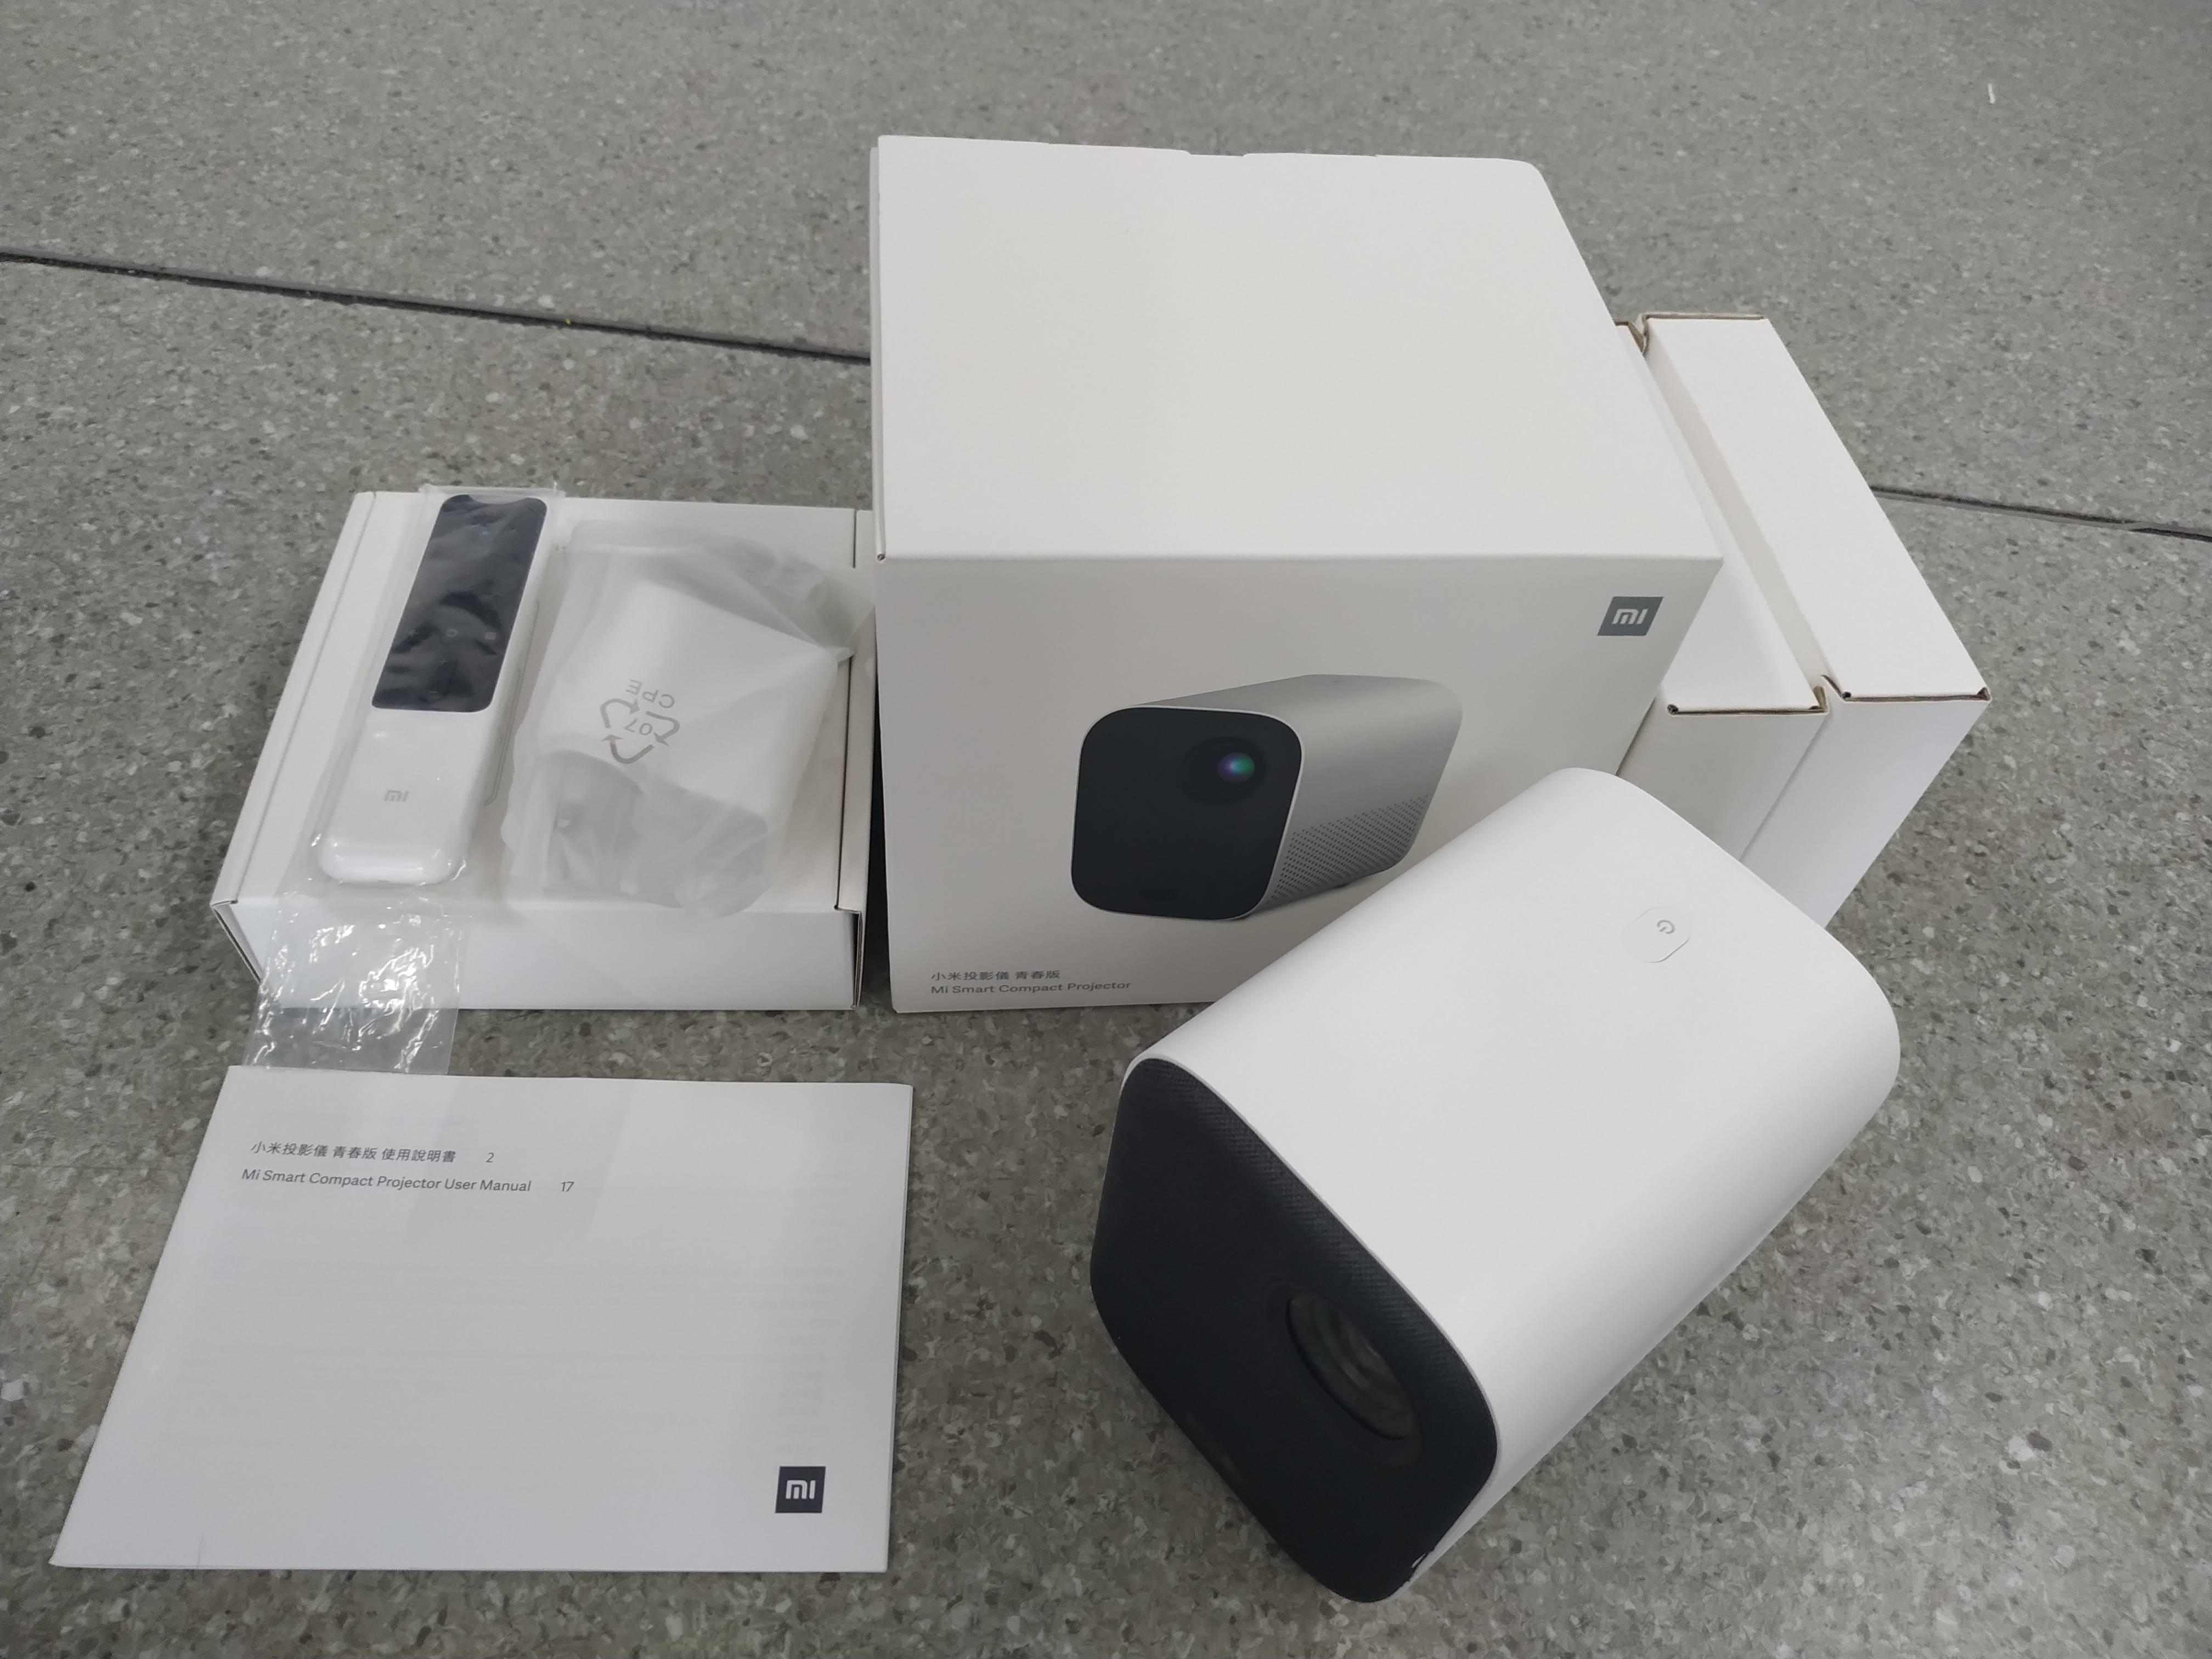 "Nova versão global xiaomi mijia projetor mini 60 - 120 ""hd completo 1080p dlp 500ans dolby áudio android 9 tv google assistente-5"